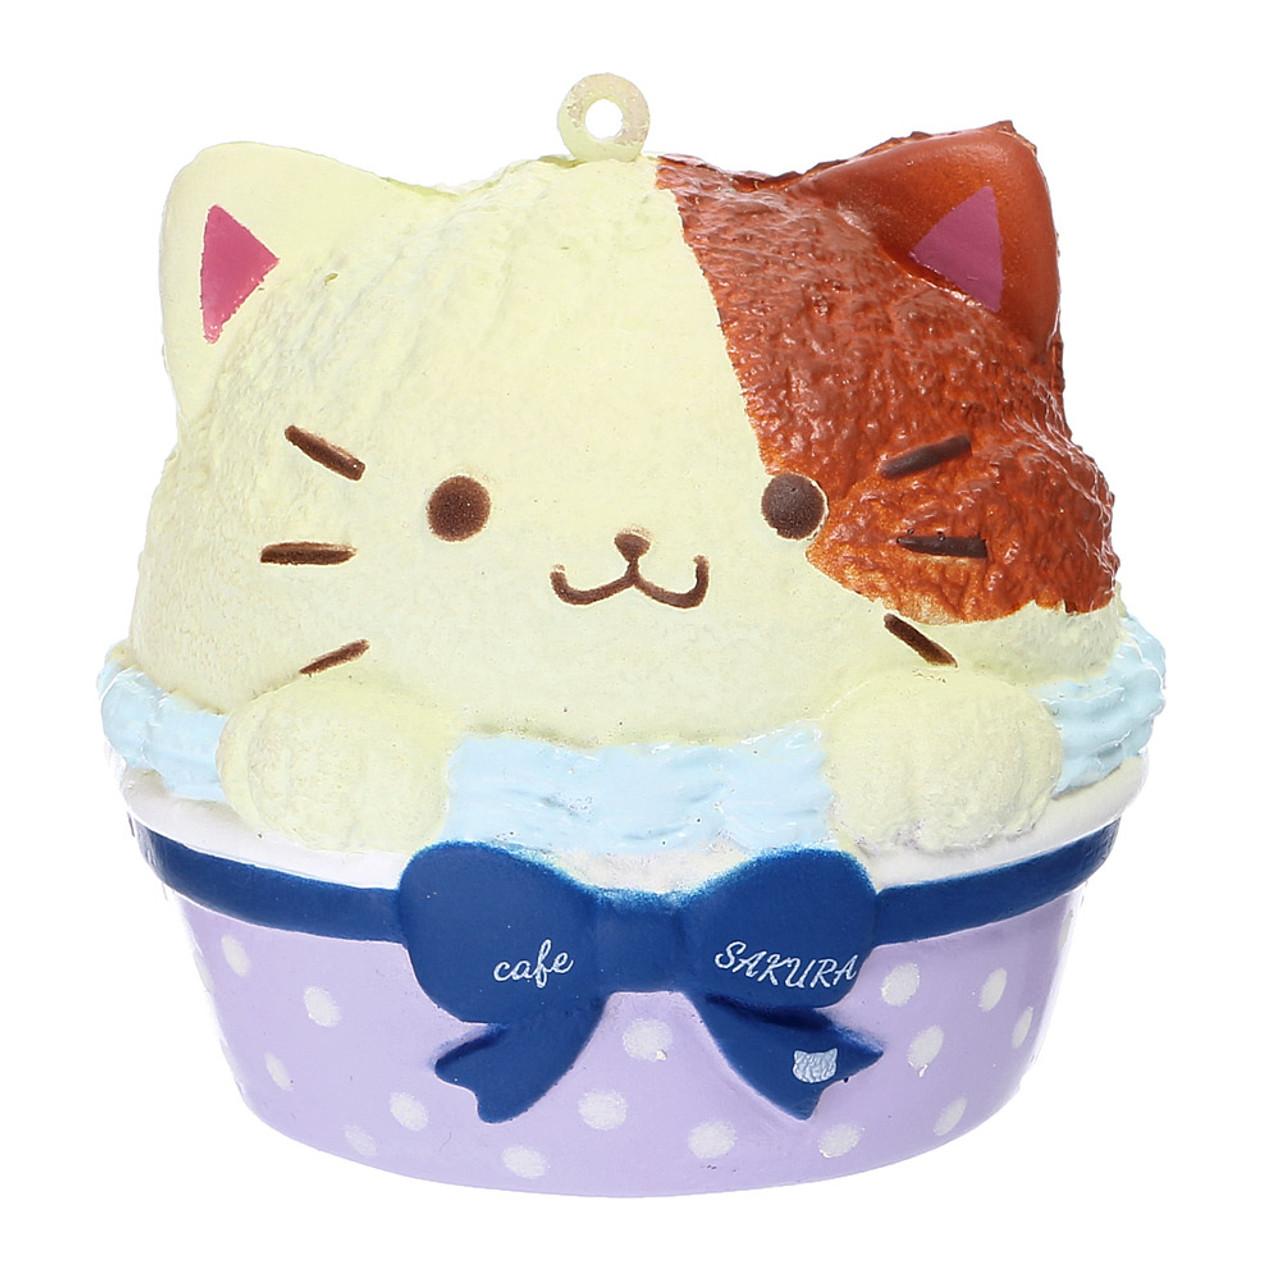 Cafe Sakura Calico Cat Cupcake Baron Mascot Squishy Toy Charm ( Front View )